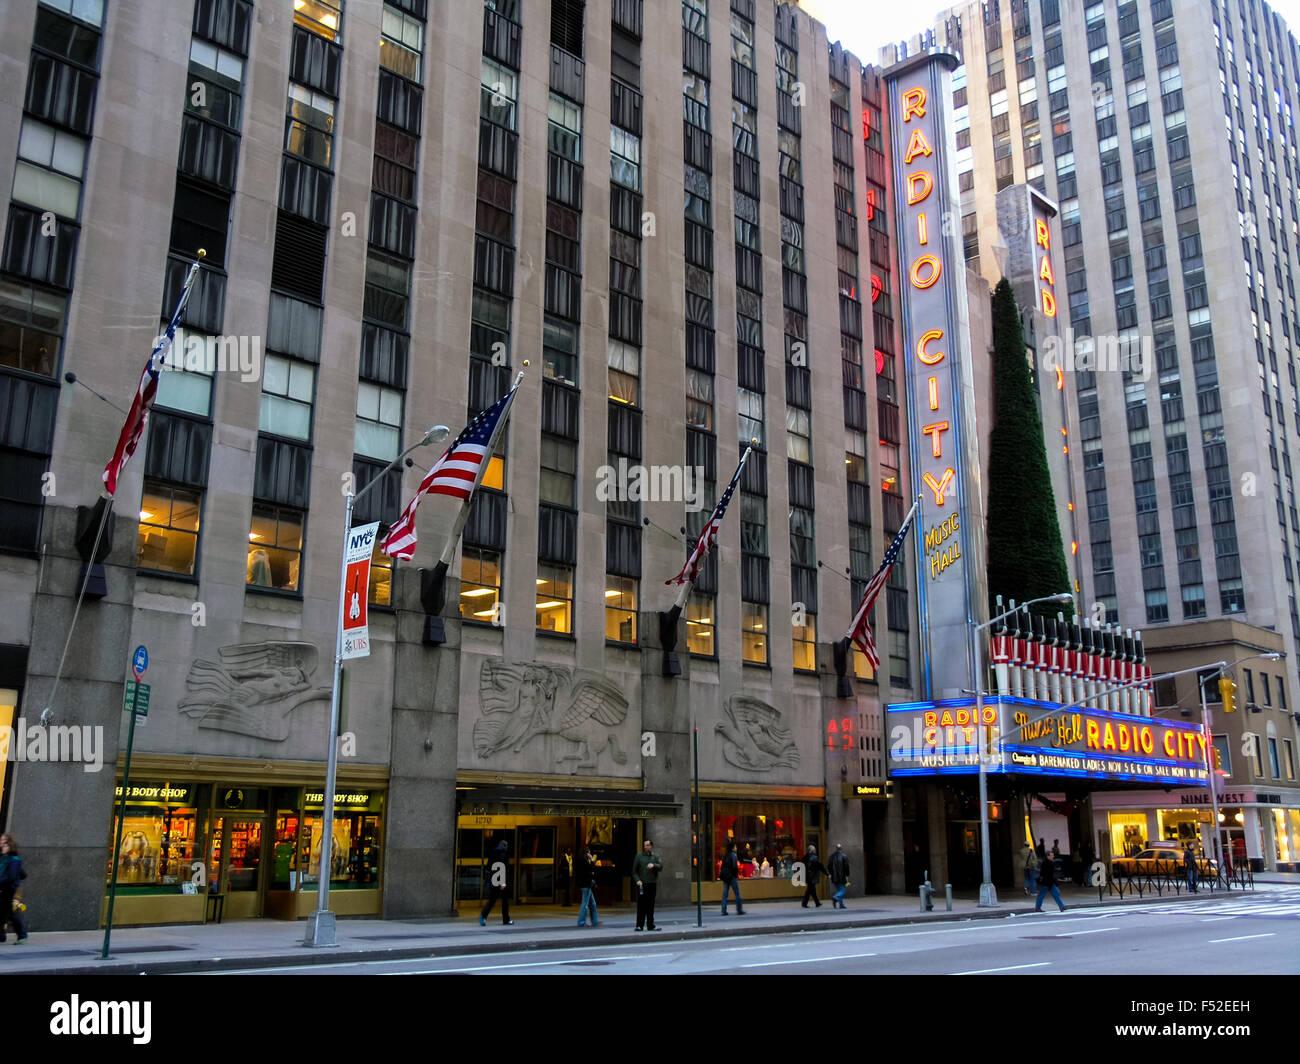 Radio City Hall building, New York, USA - Stock Image